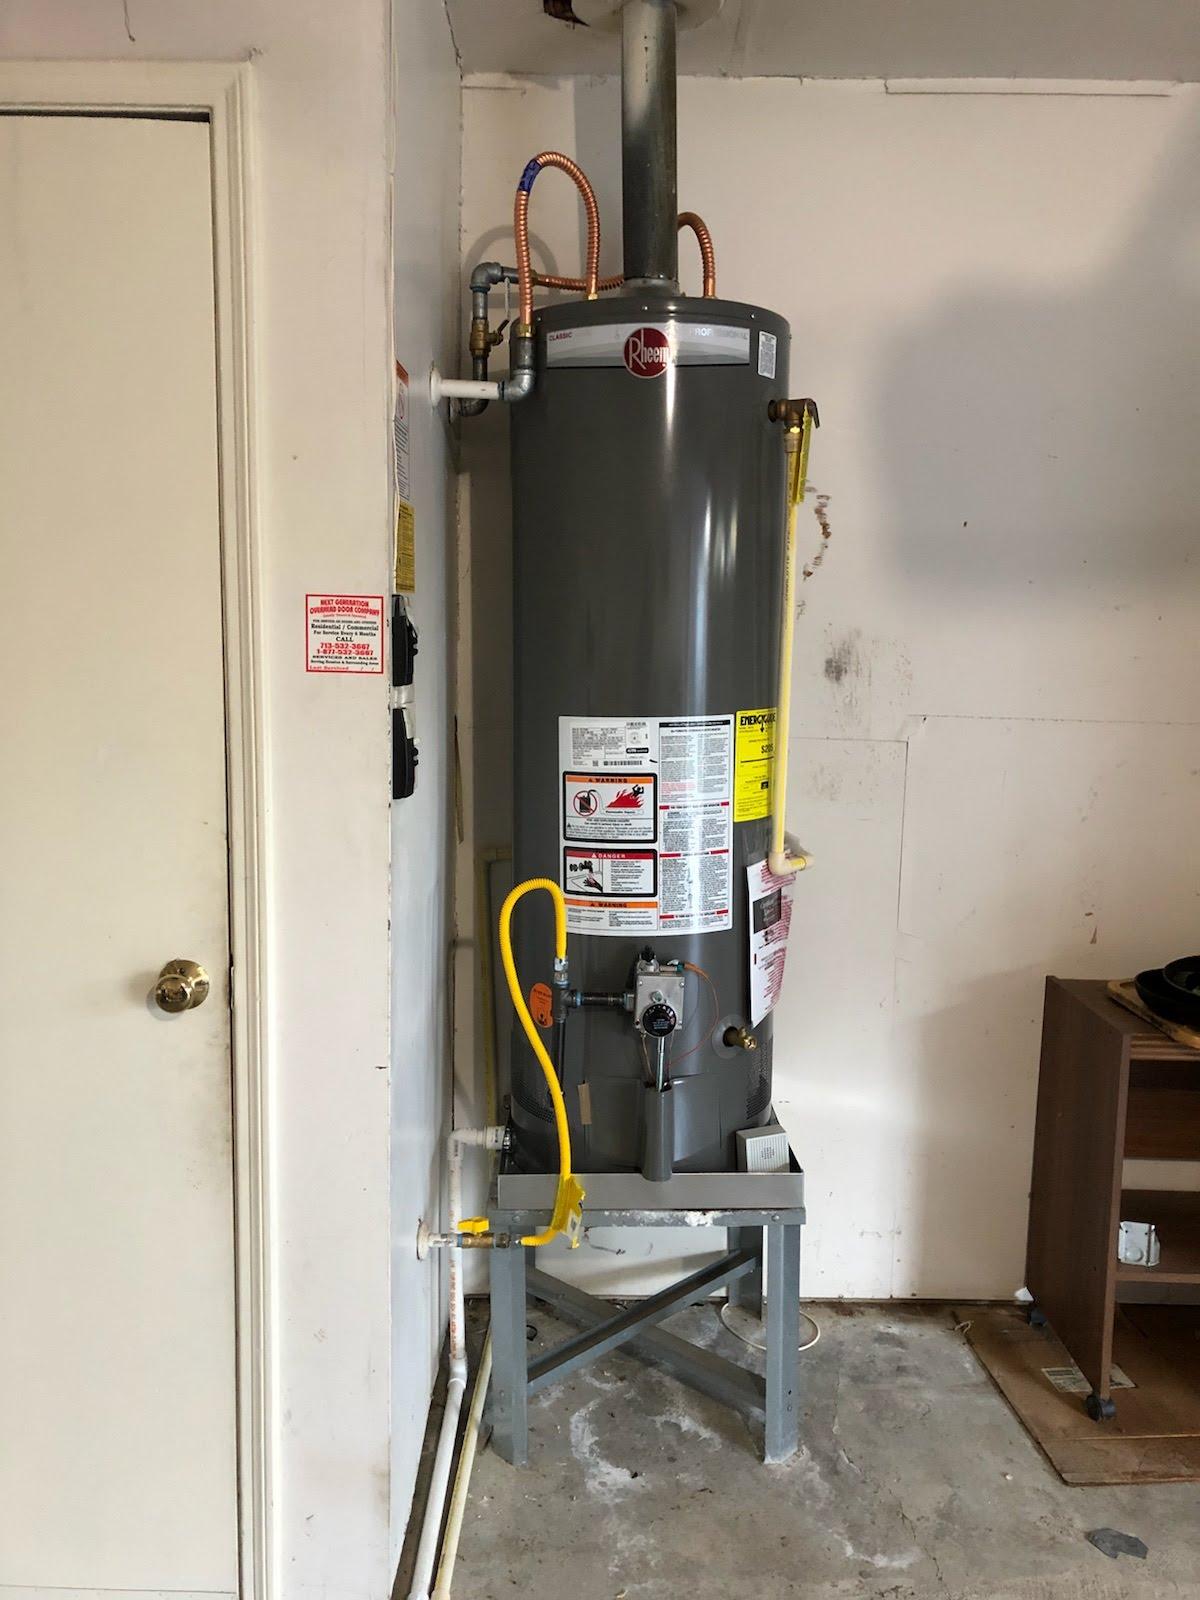 Katy Water Heaters image 91